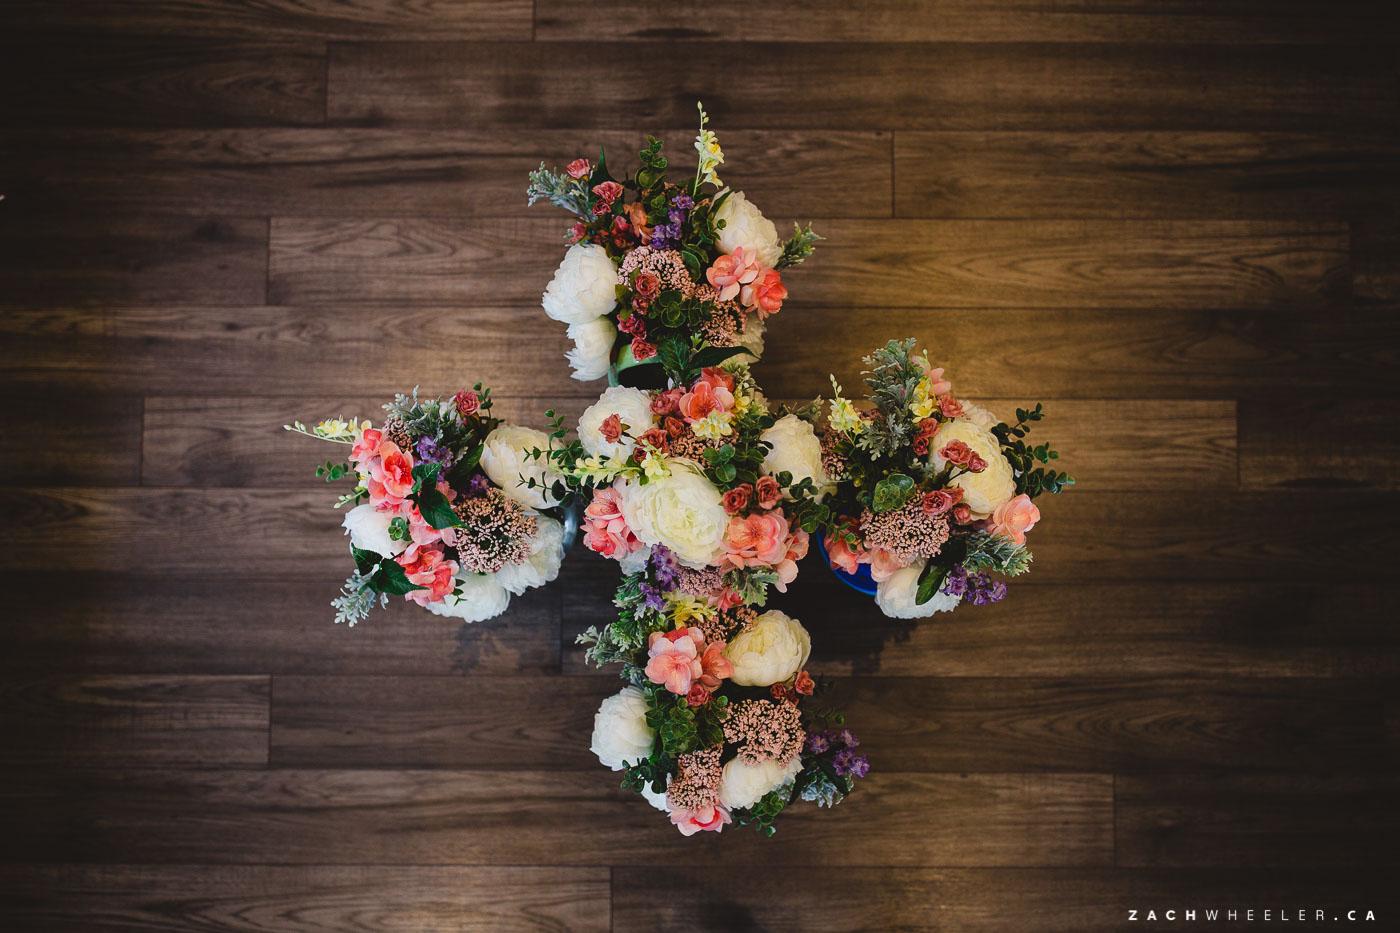 Sarah-Grant-Lesters-Fram-Wedding-17